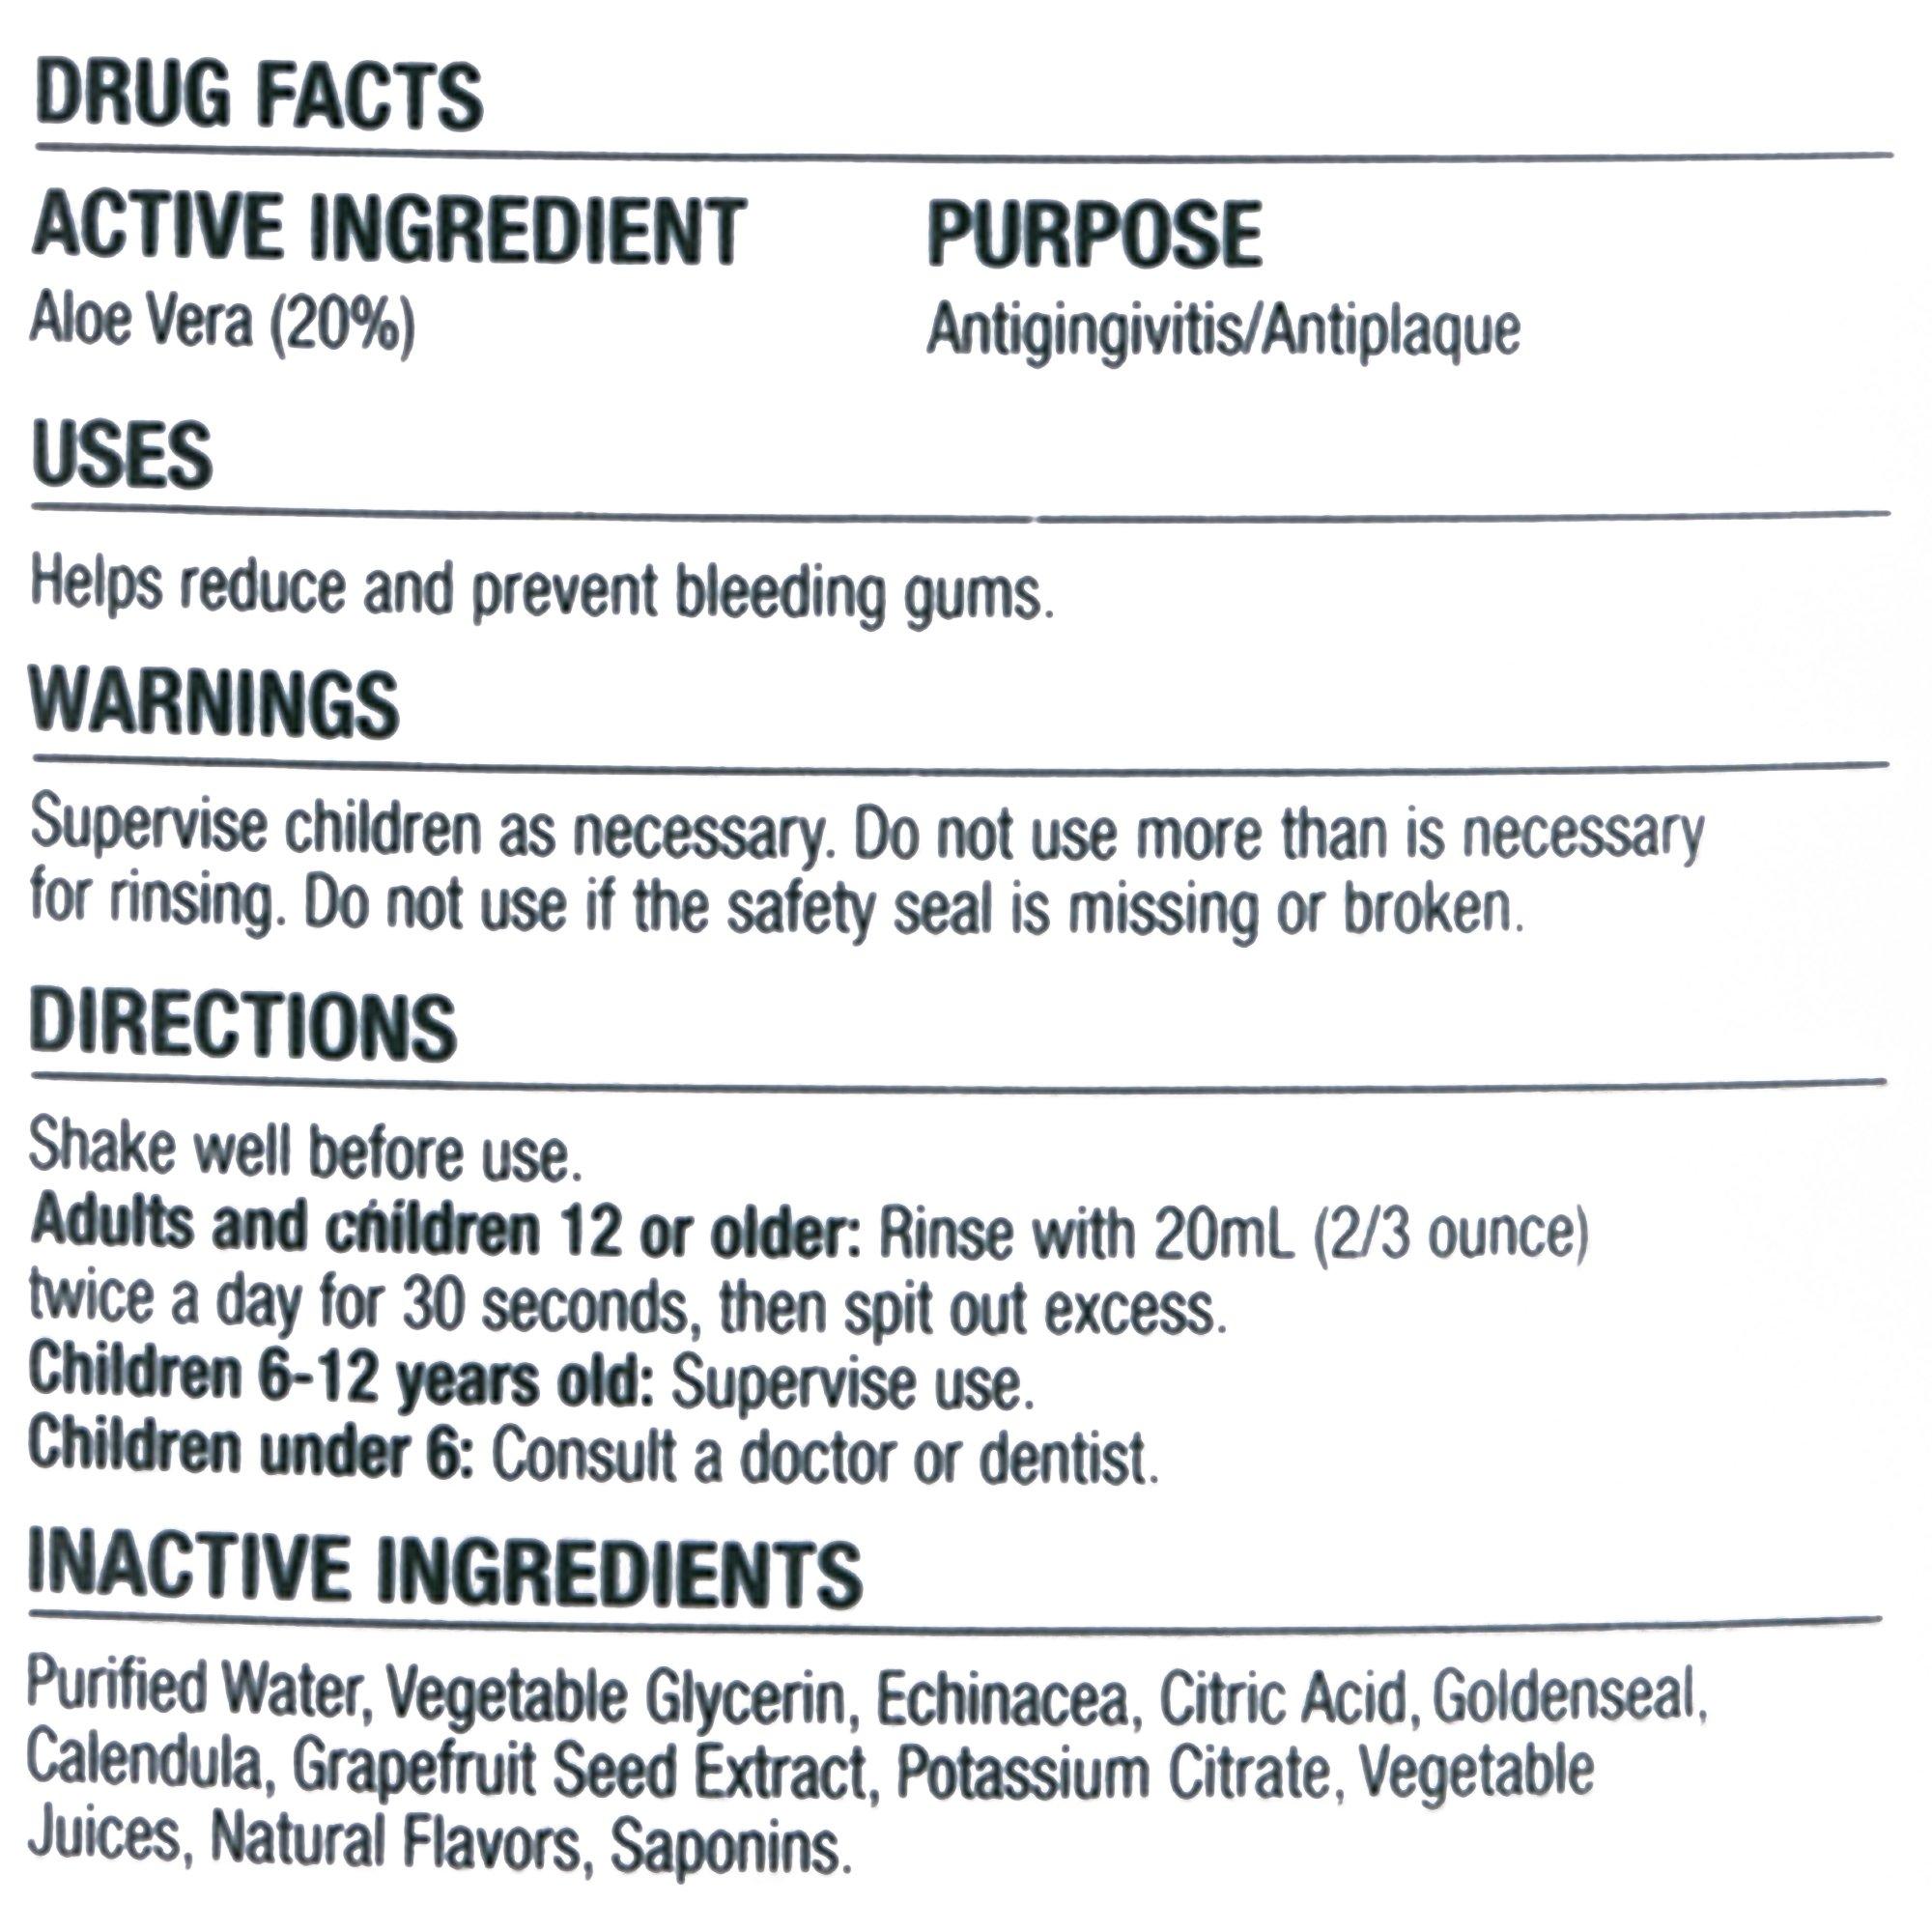 The Natural Dentist Healthy Gums Antigingivitis Mouthwash, Orange Zest, 16.9 Ounce Bottle (Pack of 3), Alcohol-Free Mouthwash for Daily Use, Treats Bleeding Gums and Fights Gingivitis, 20% Aloe Vera by Natural Dentist (Image #3)